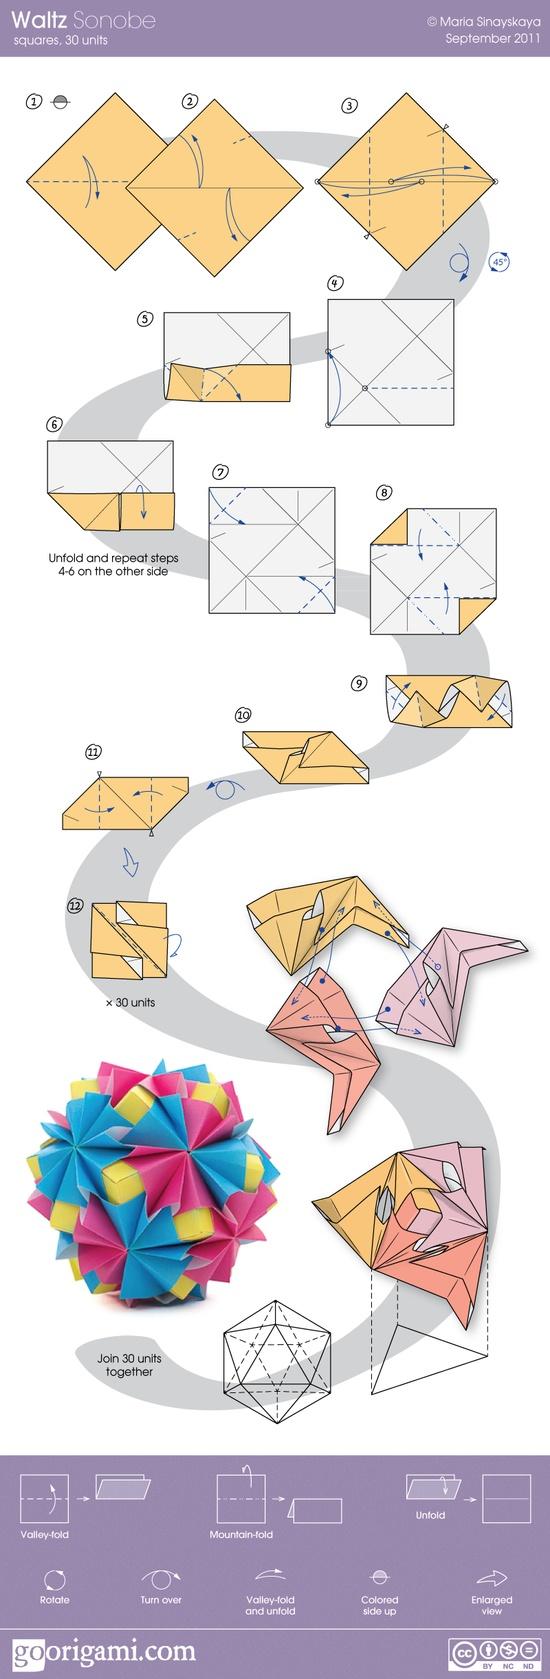 origami waltz sonobe diagram origami and papercrafts pinterest rh pinterest com Origami Fireworks Step by Step Origami Yami Yamauchi